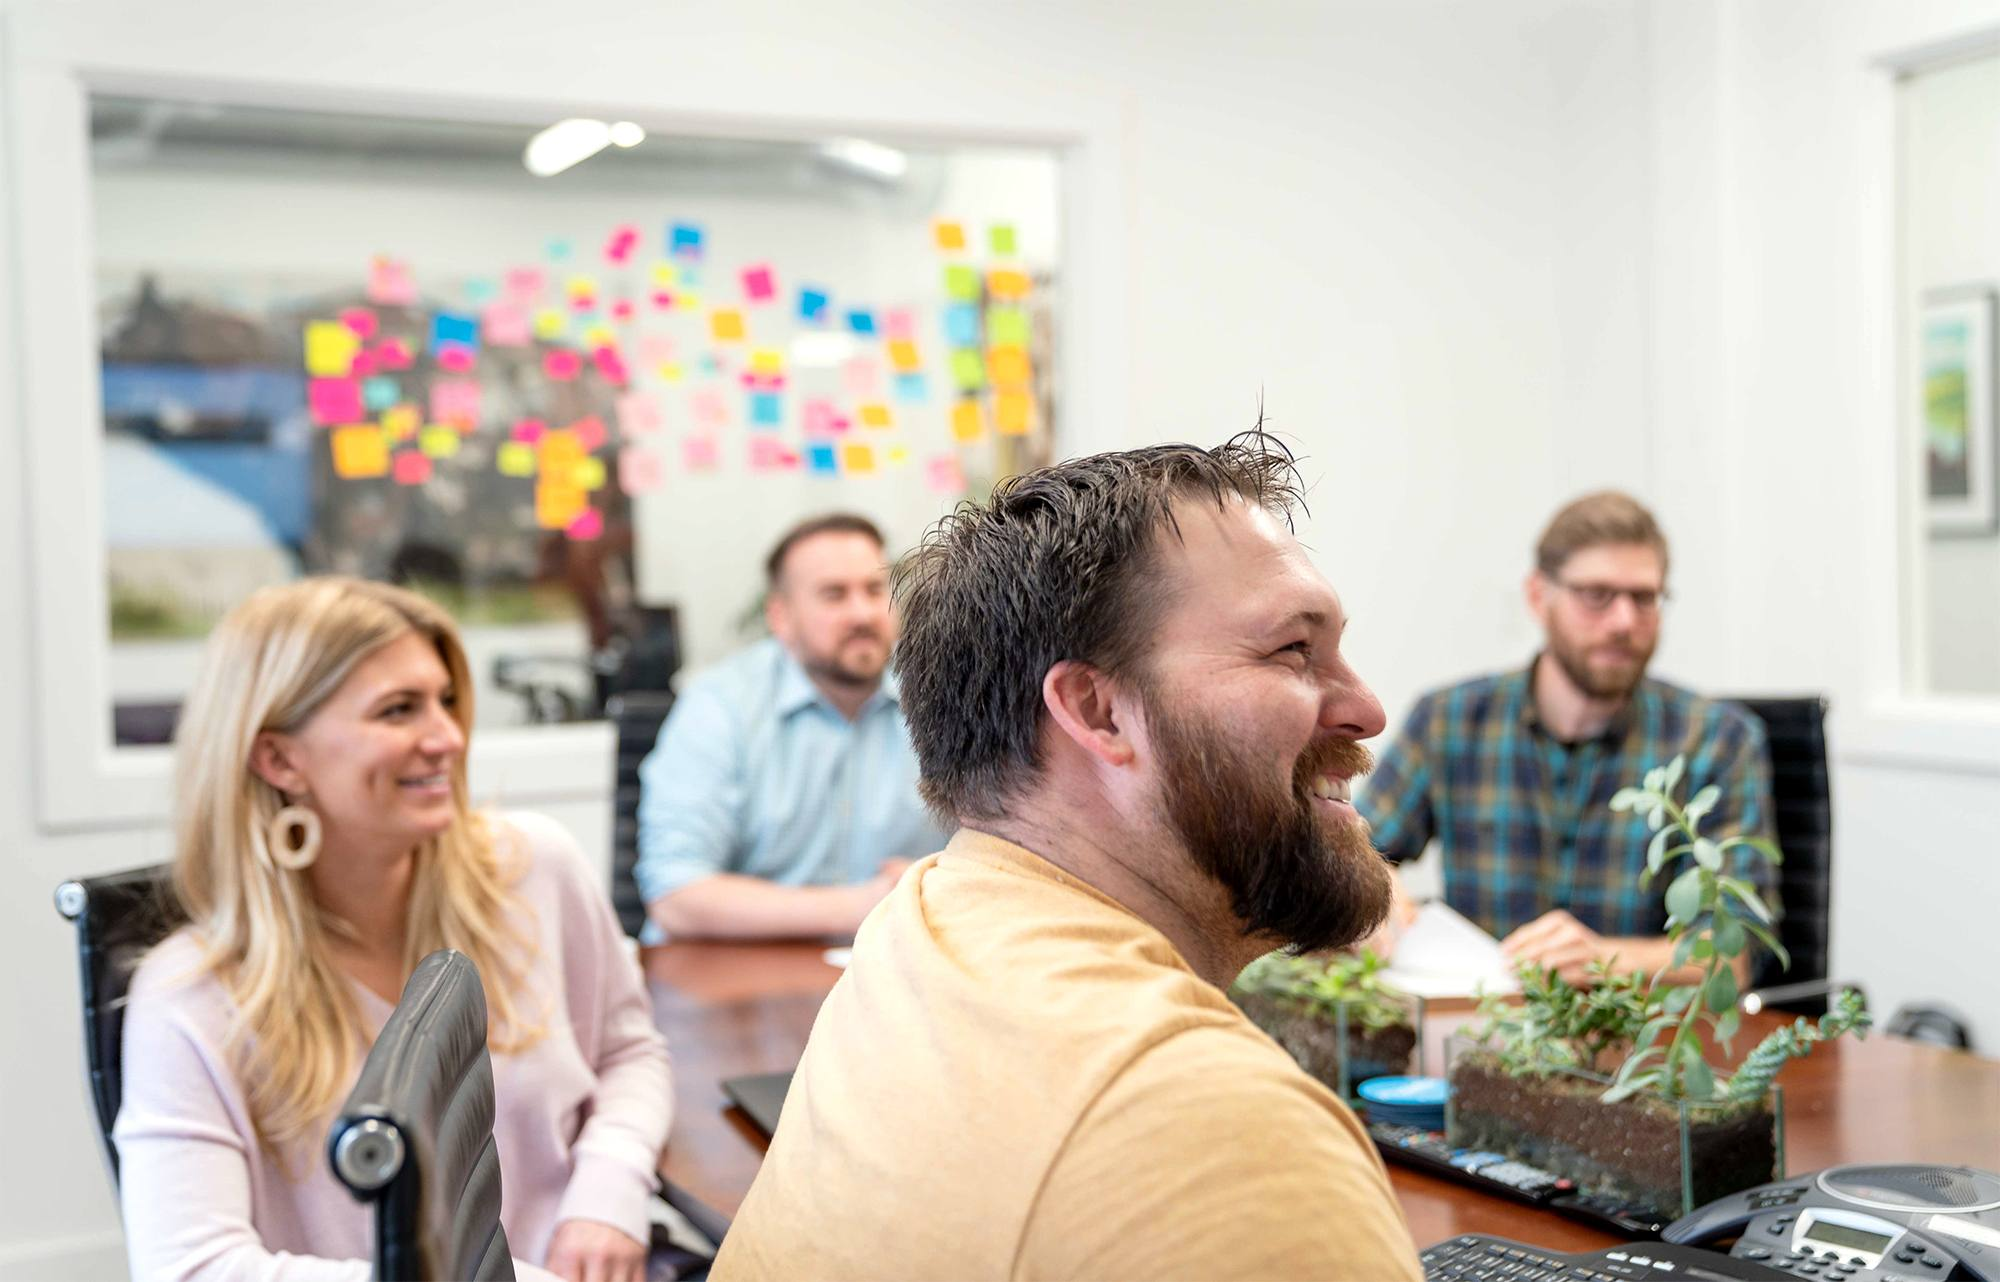 oneupweb digital marketing team smiling, planning, and strategizing